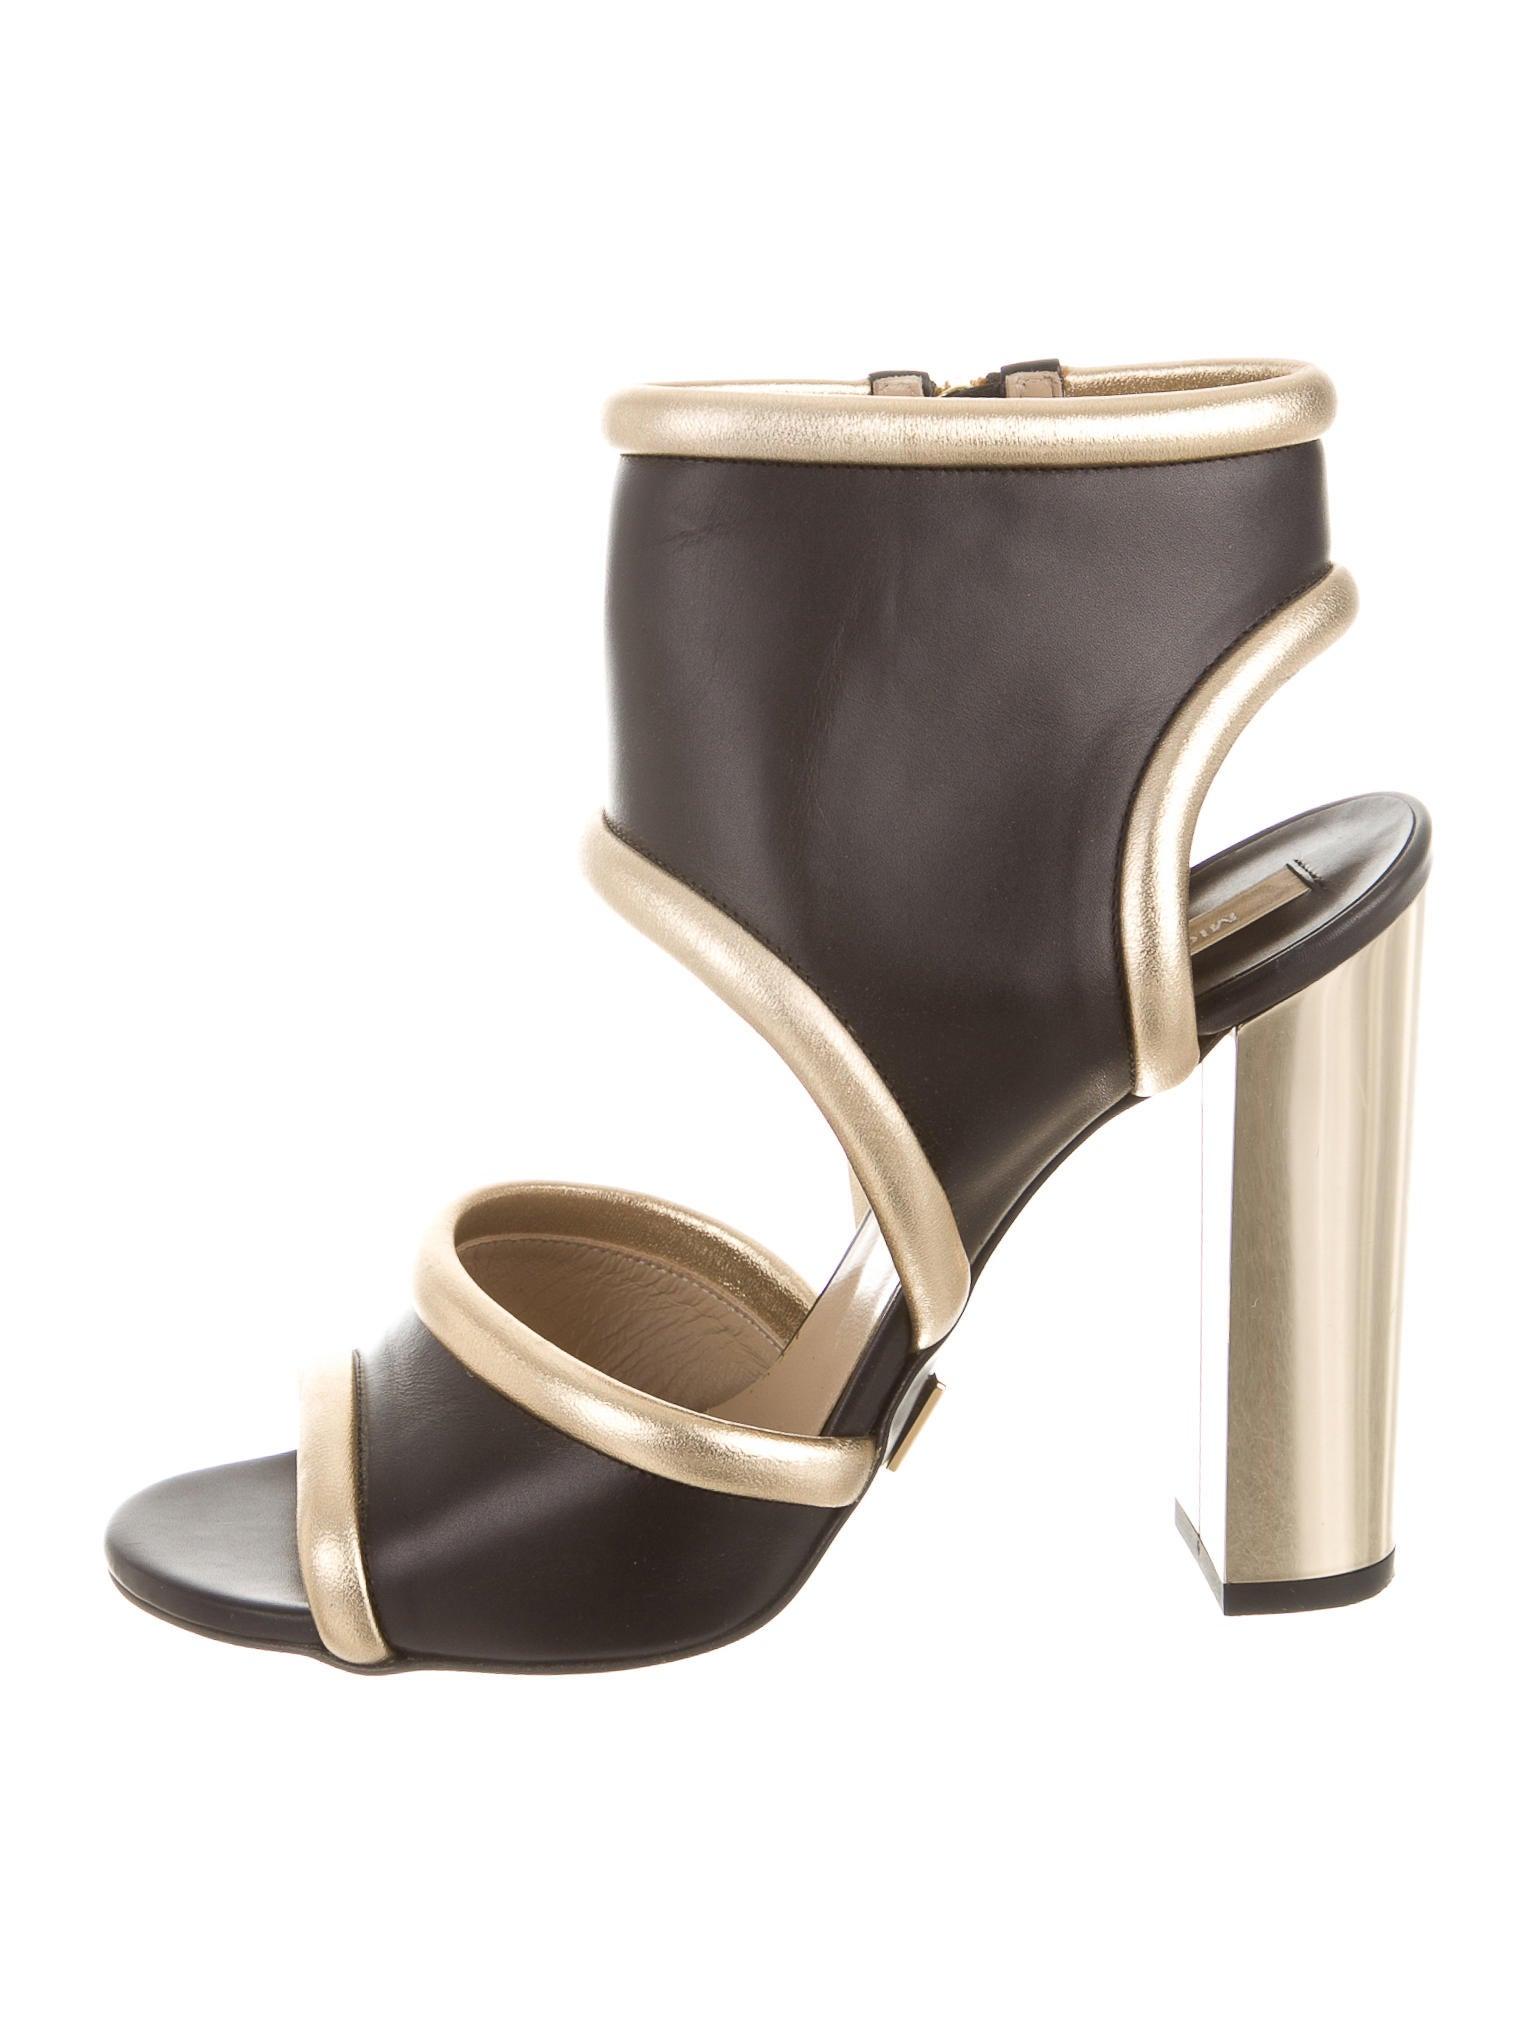 michael kors metallic leather sandals shoes mic42228